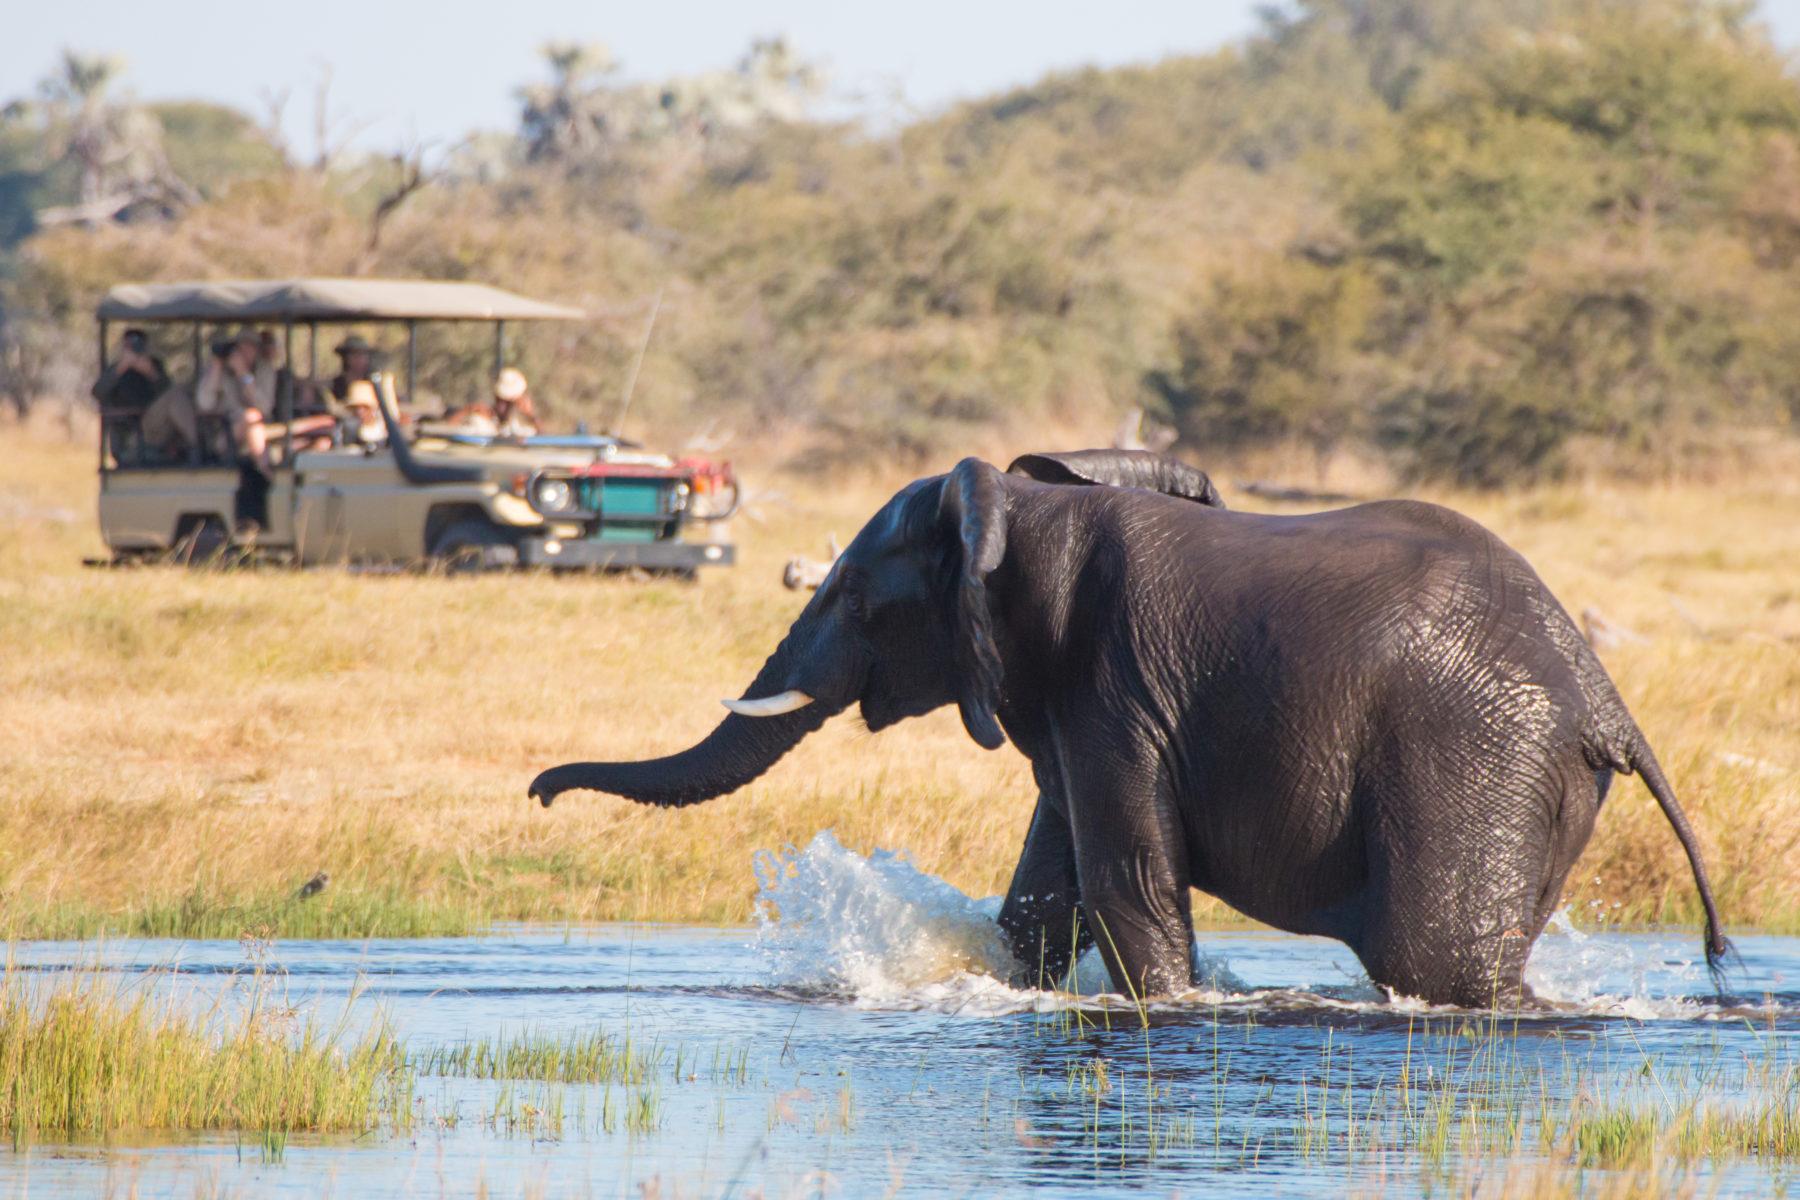 Desert & Delta empowering Botswana through tourism